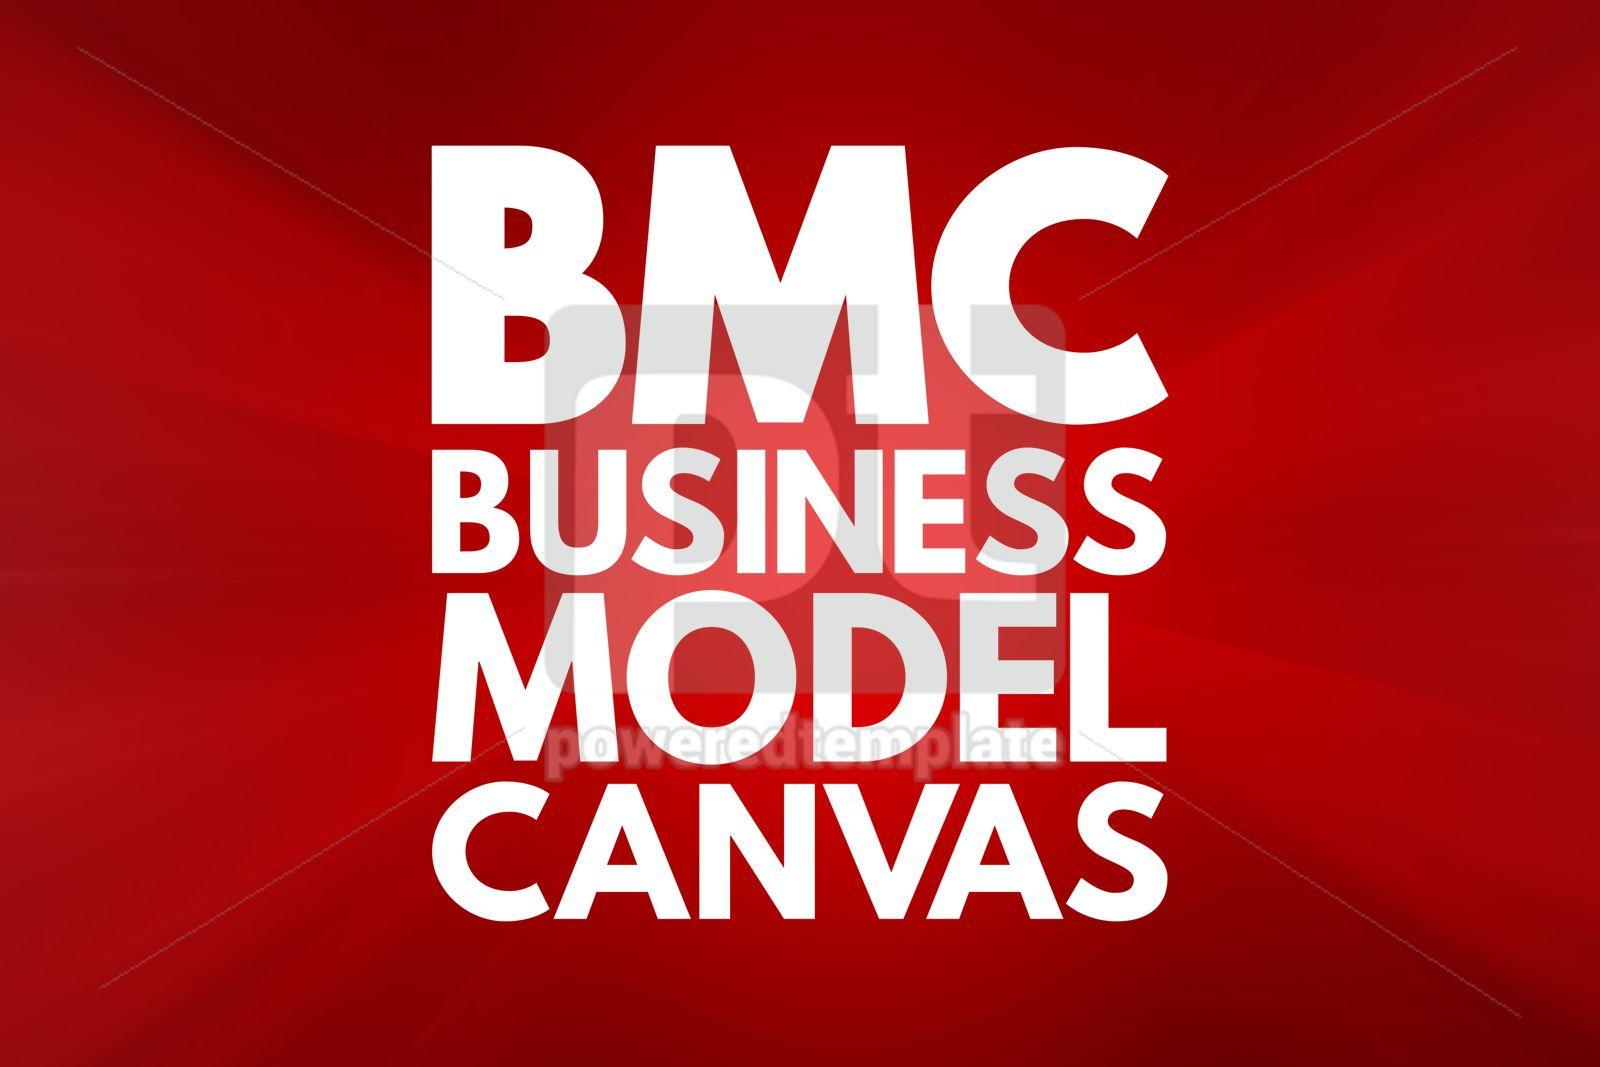 BMC - Business Model Canvas acronym business concept background, 16553, Business — PoweredTemplate.com